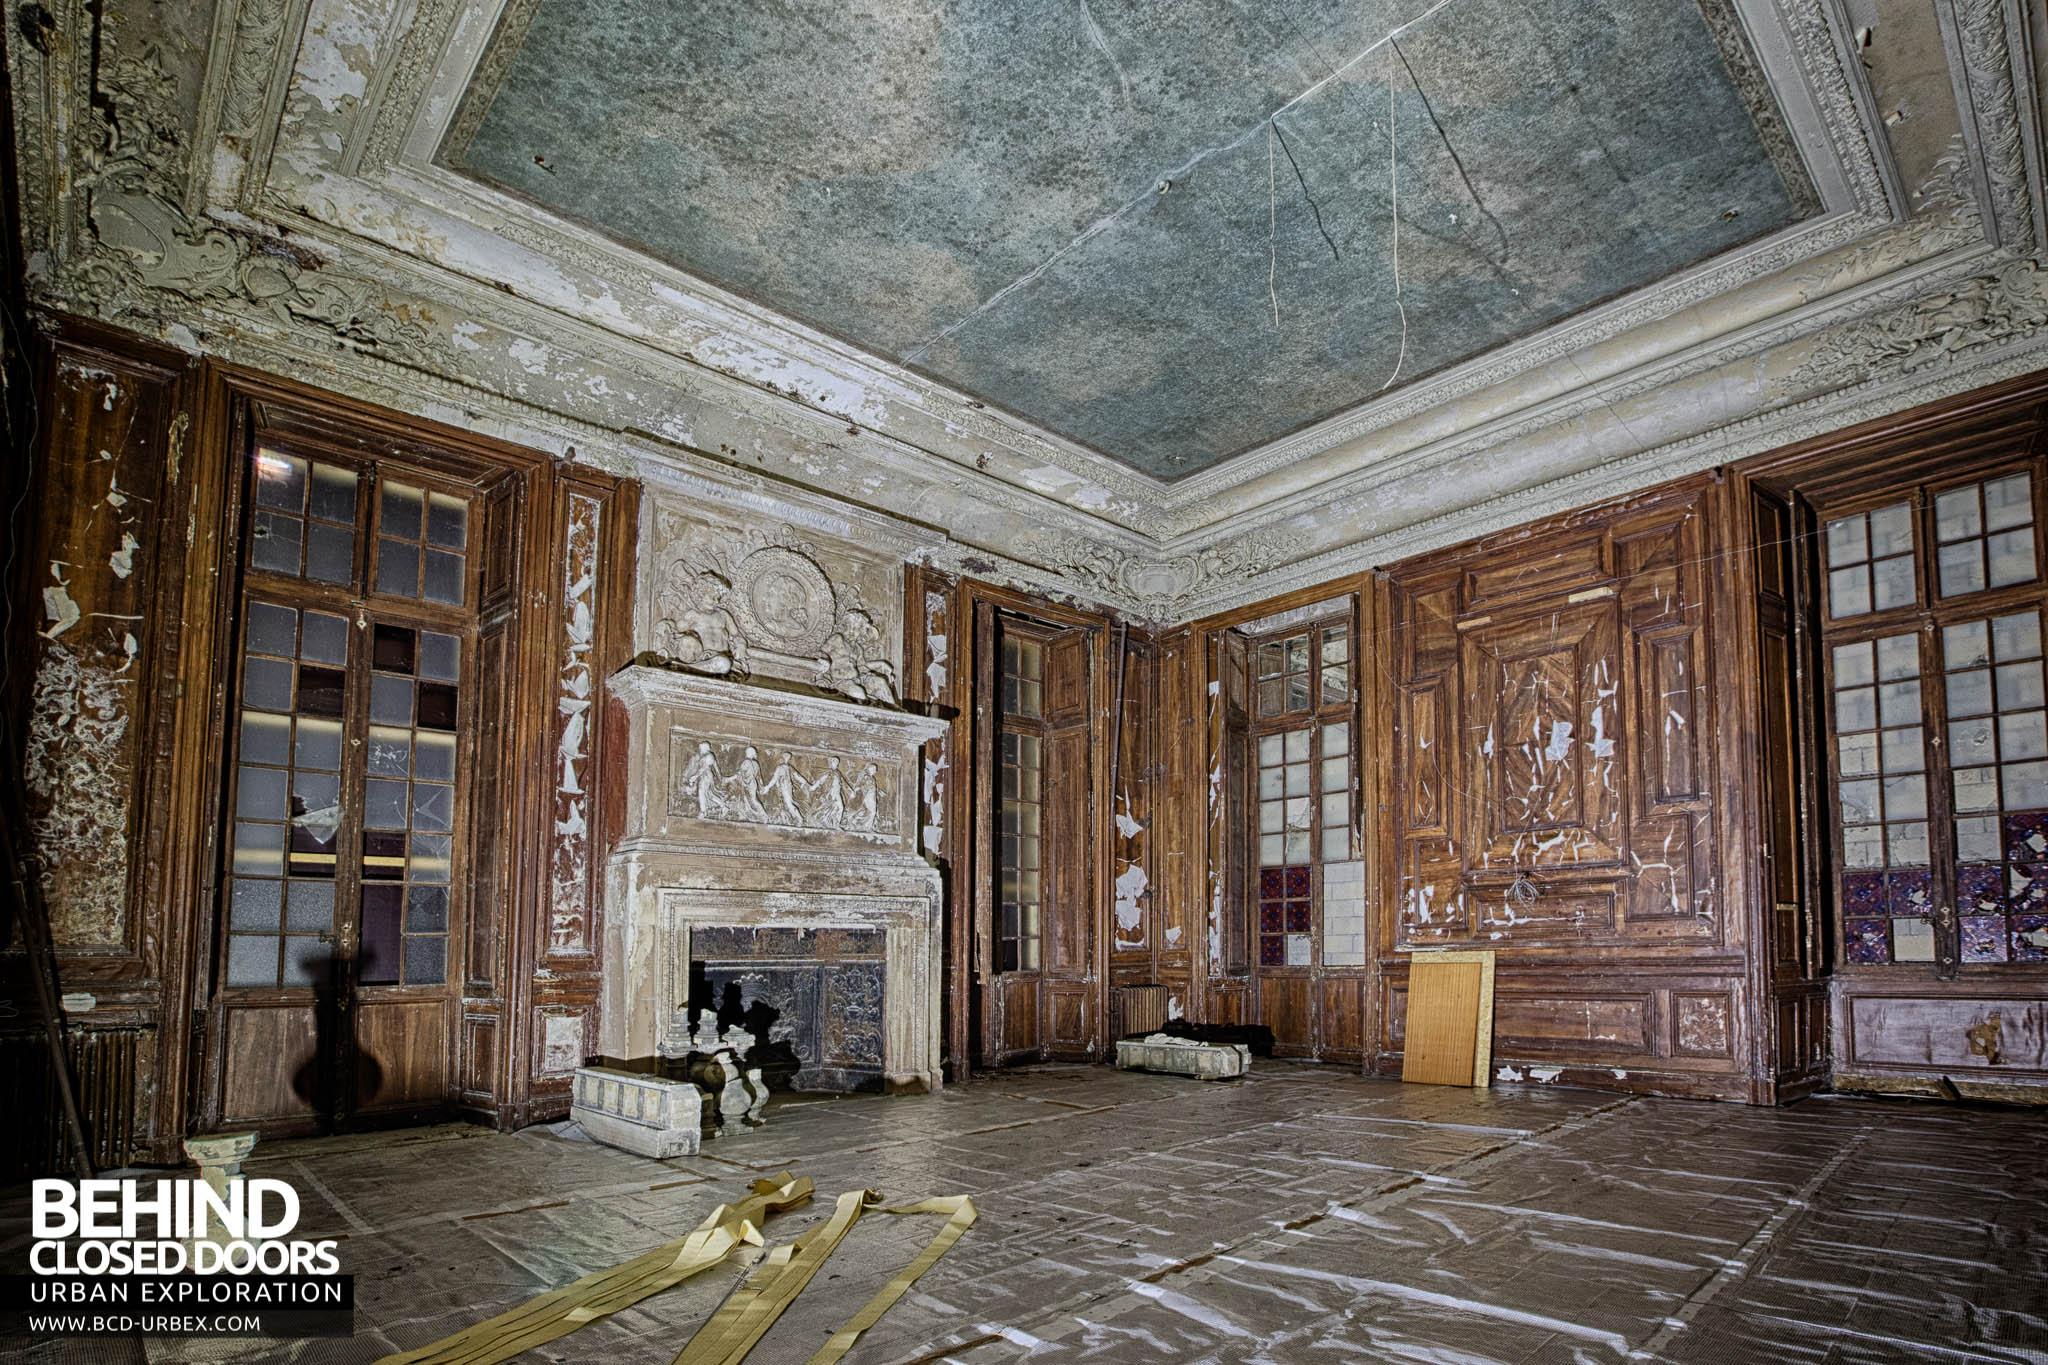 Ch teau de carnelle france urbex behind closed doors for Interieur francais